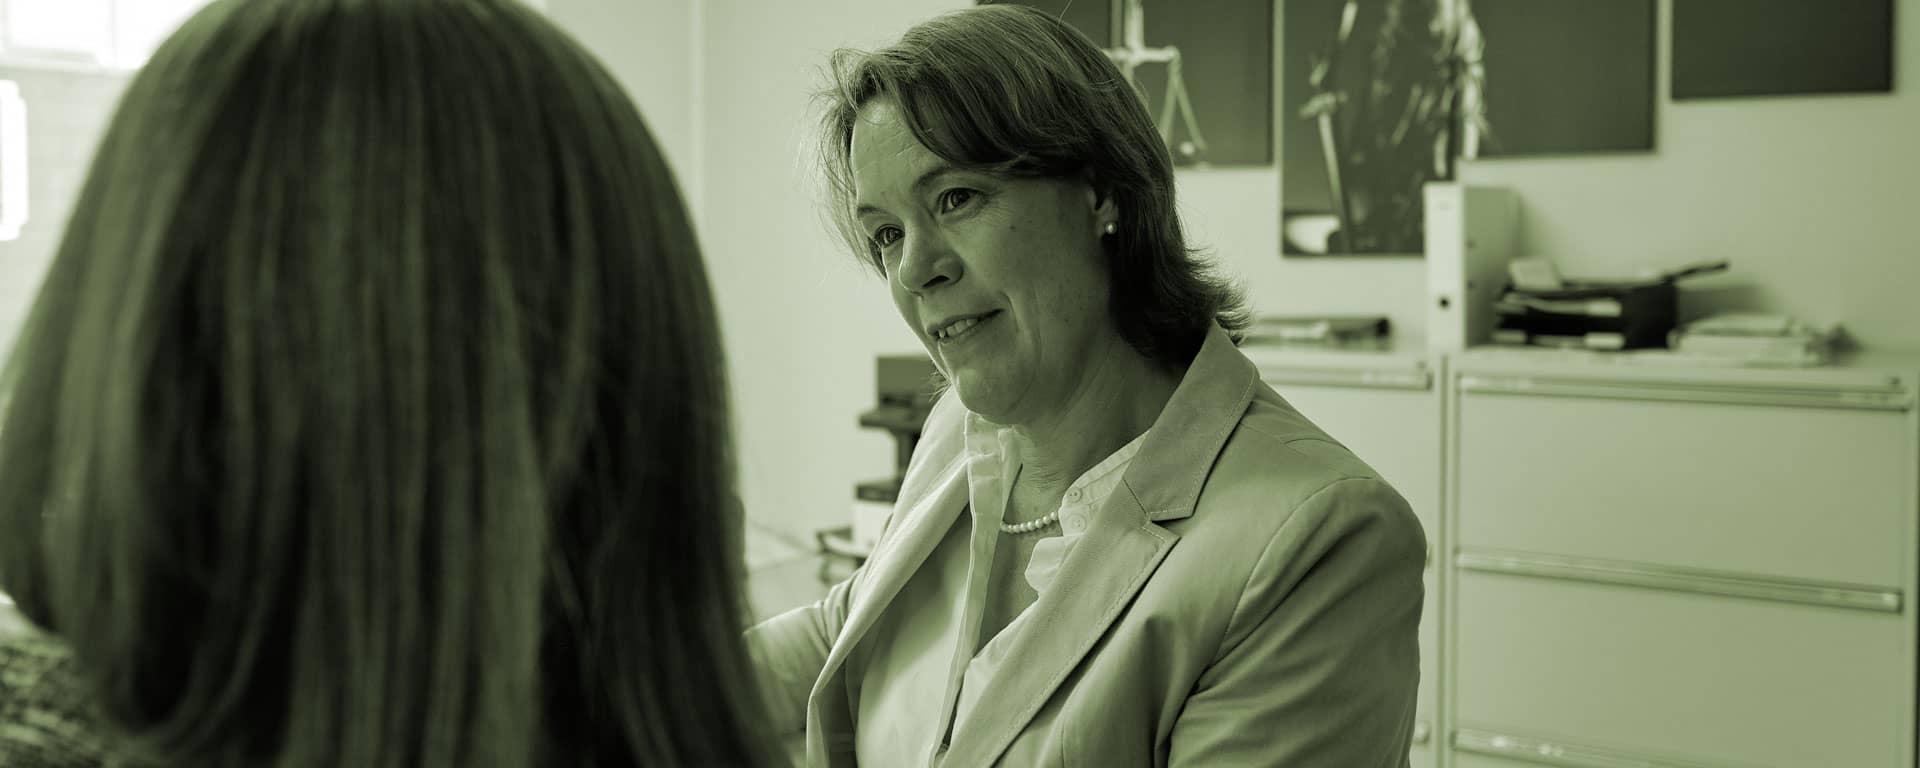 Krebs & Partner Rechtsanwälte Heinsberg